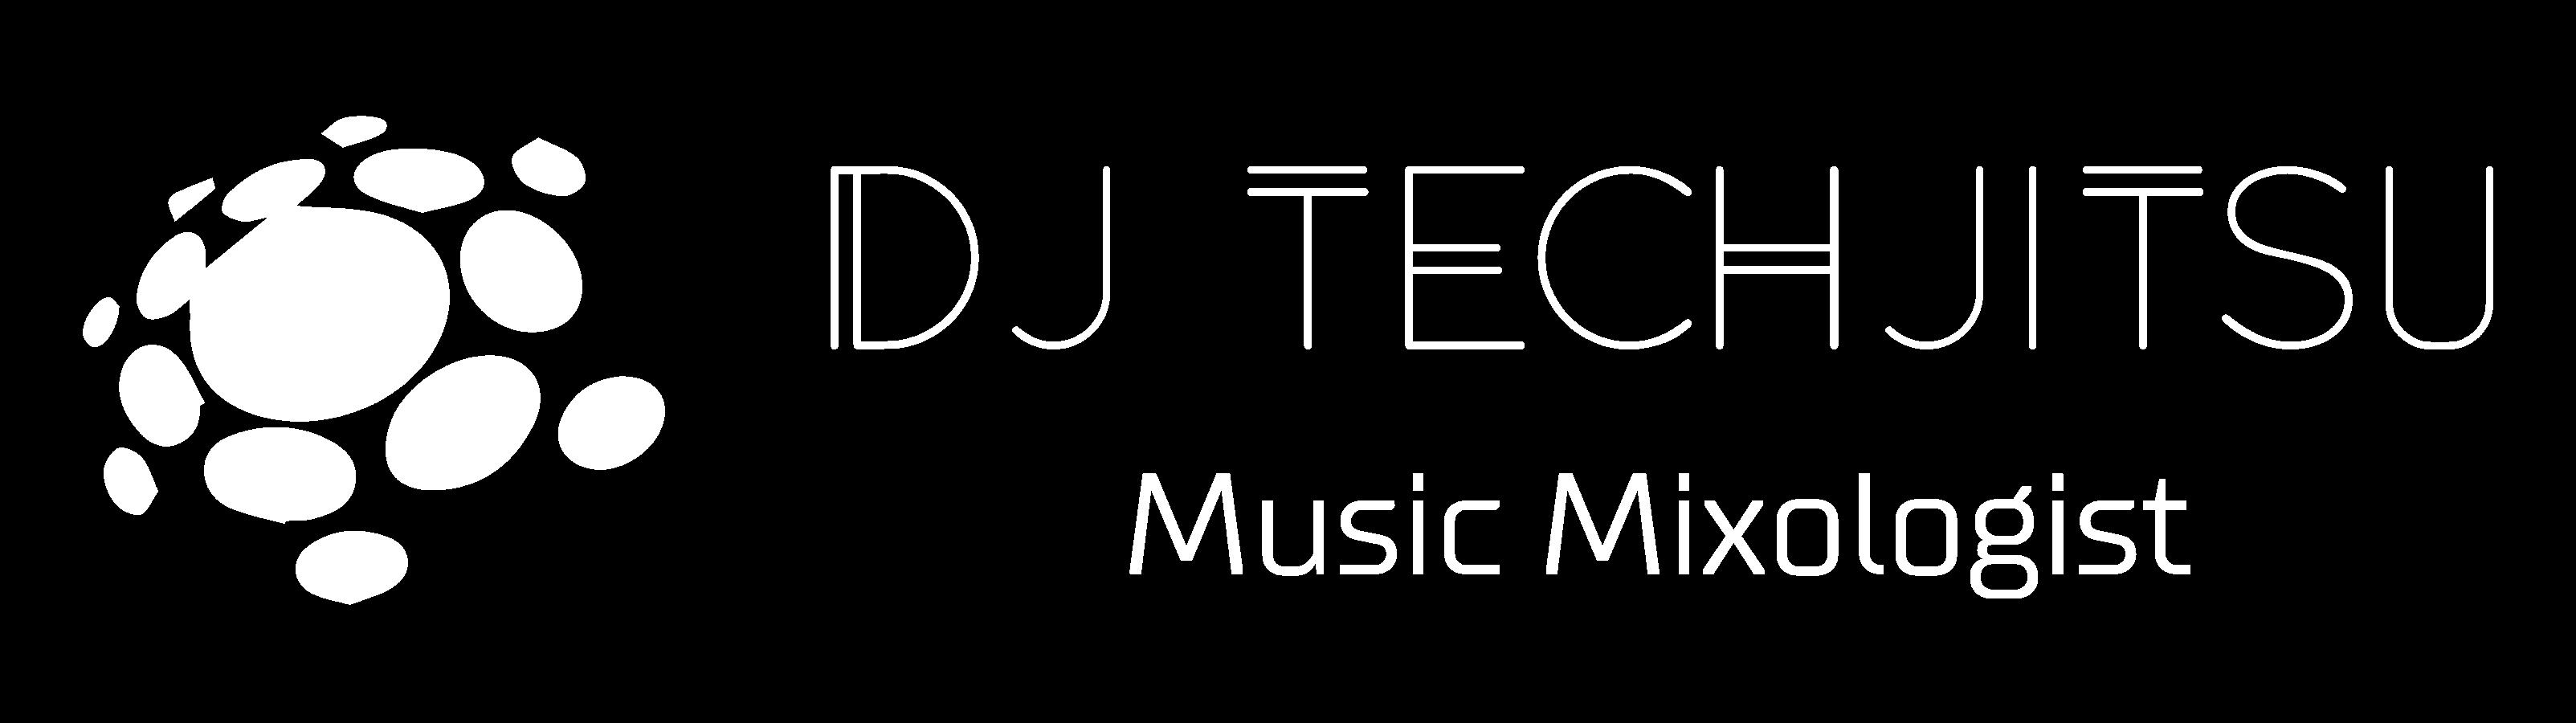 Techjitsu Logo